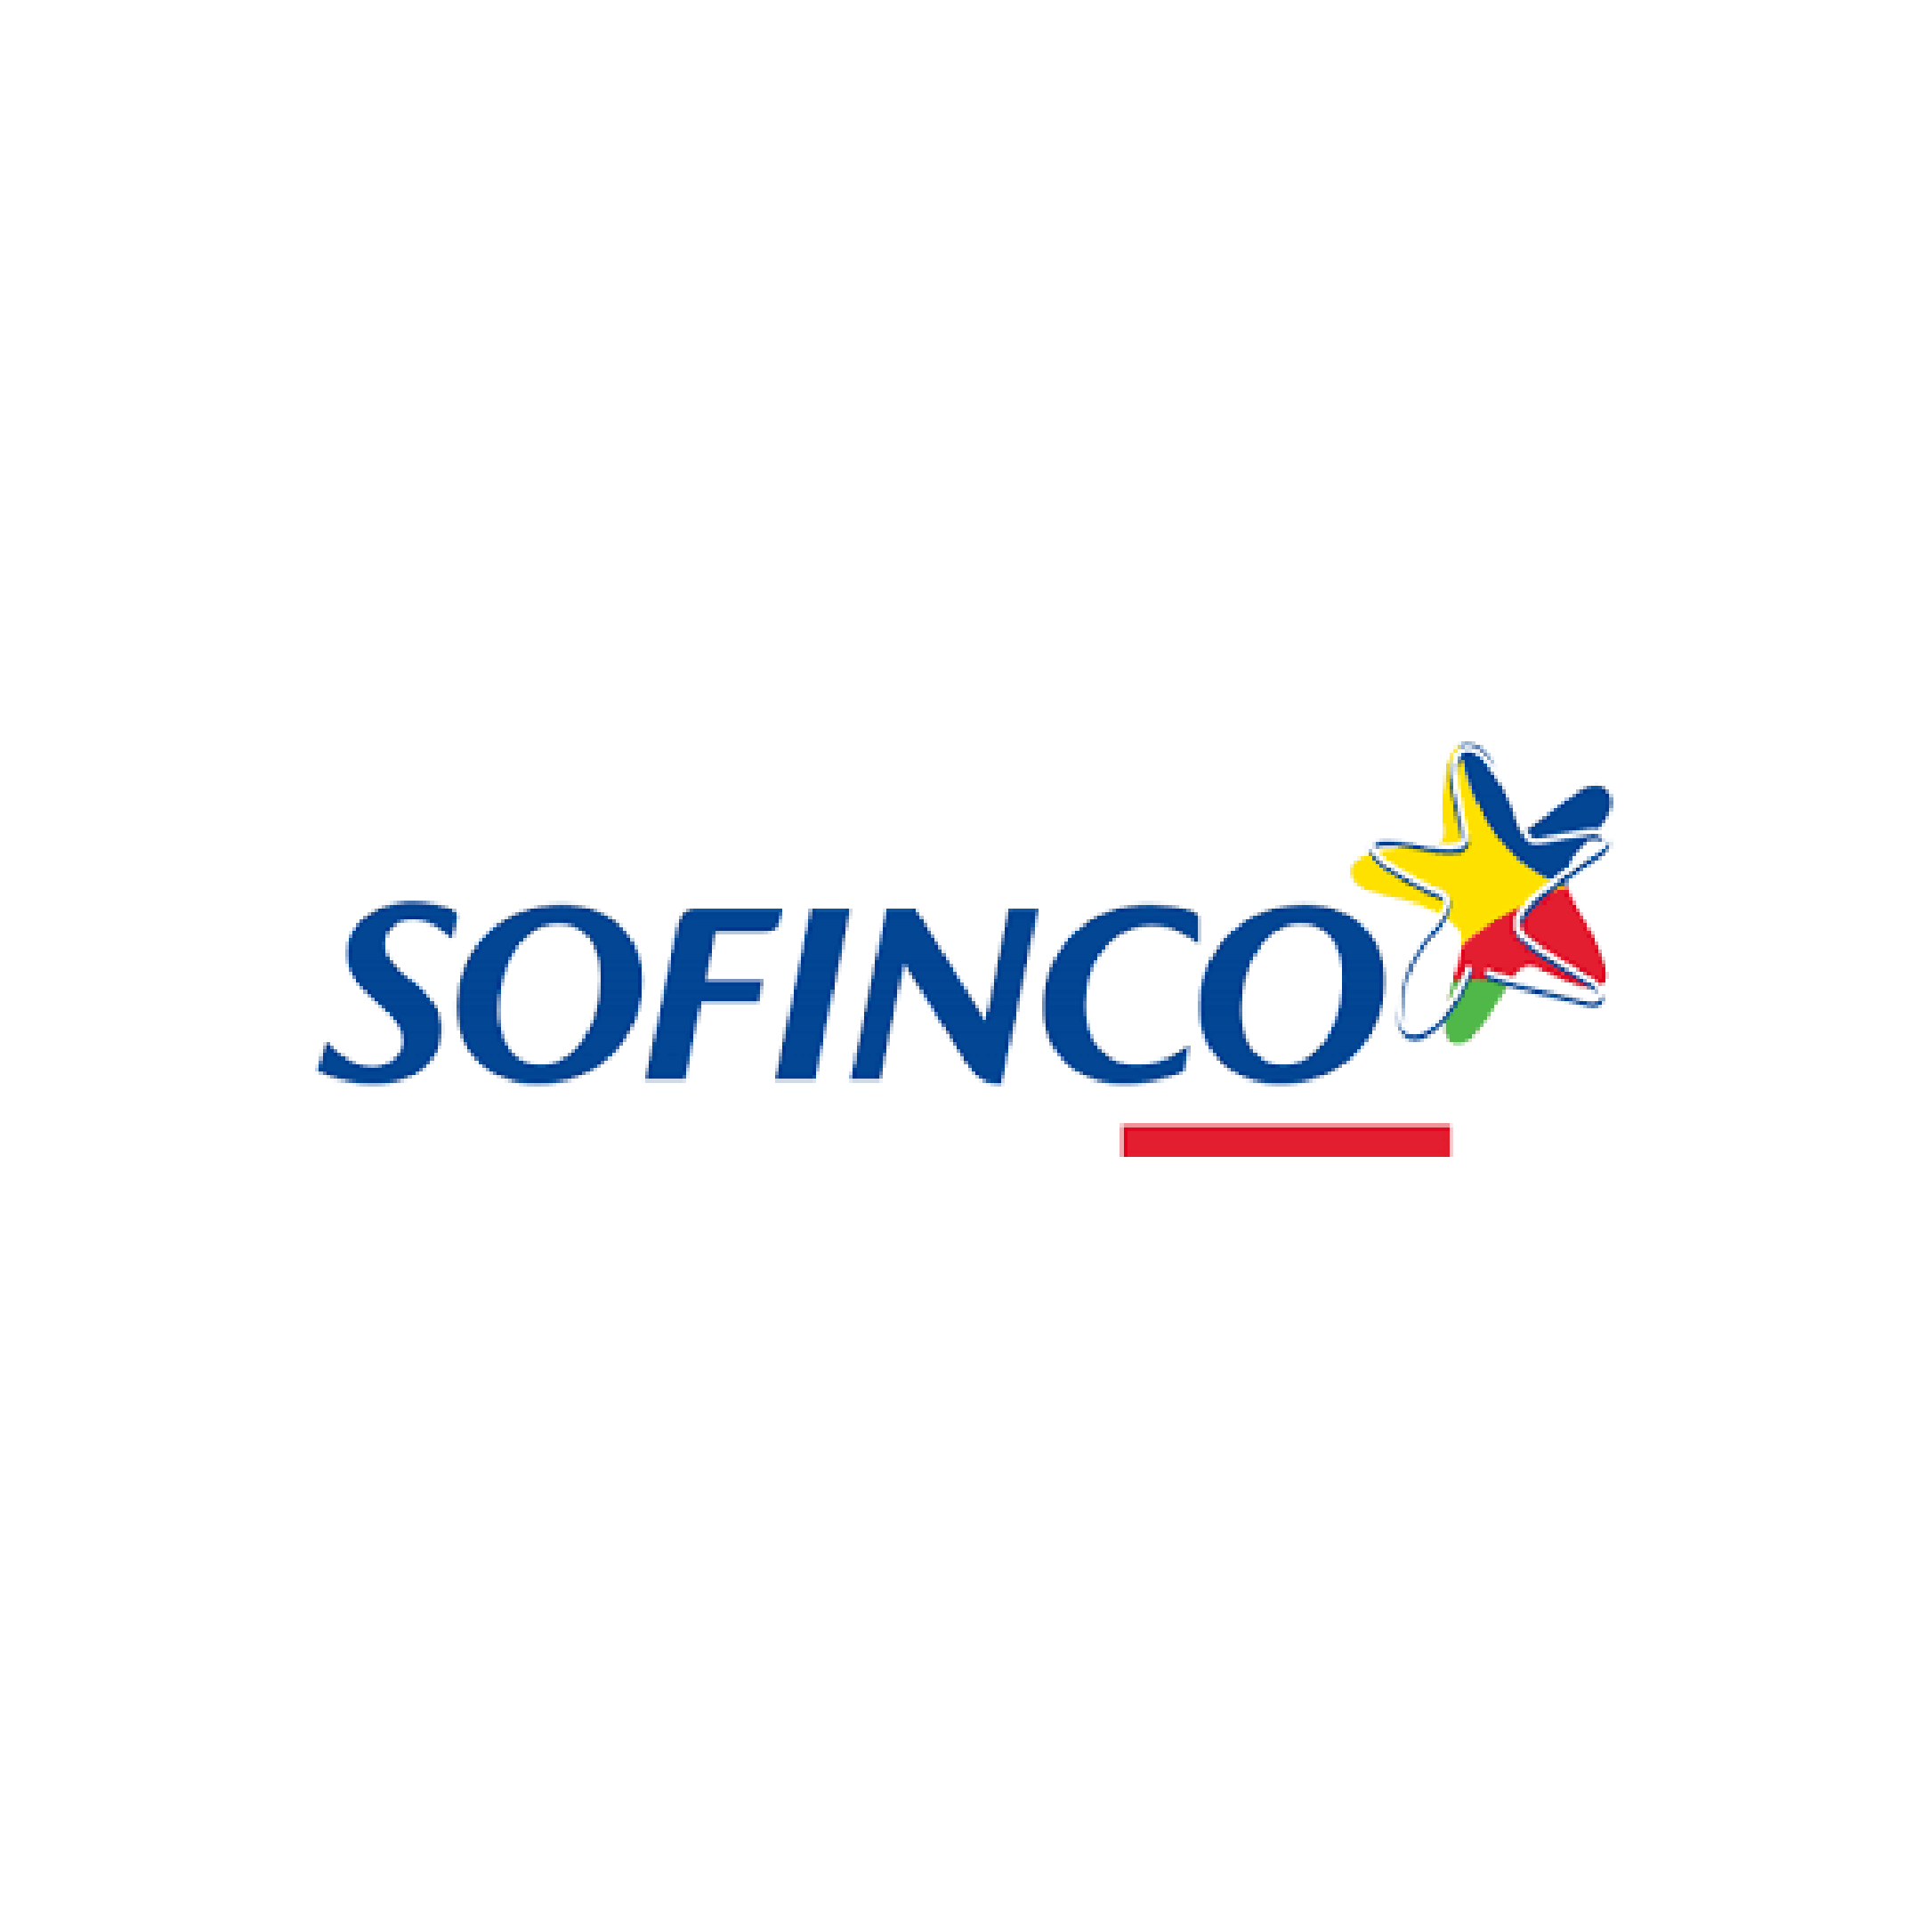 DialOnce-Assurance-Sofinco-logo-Assurance